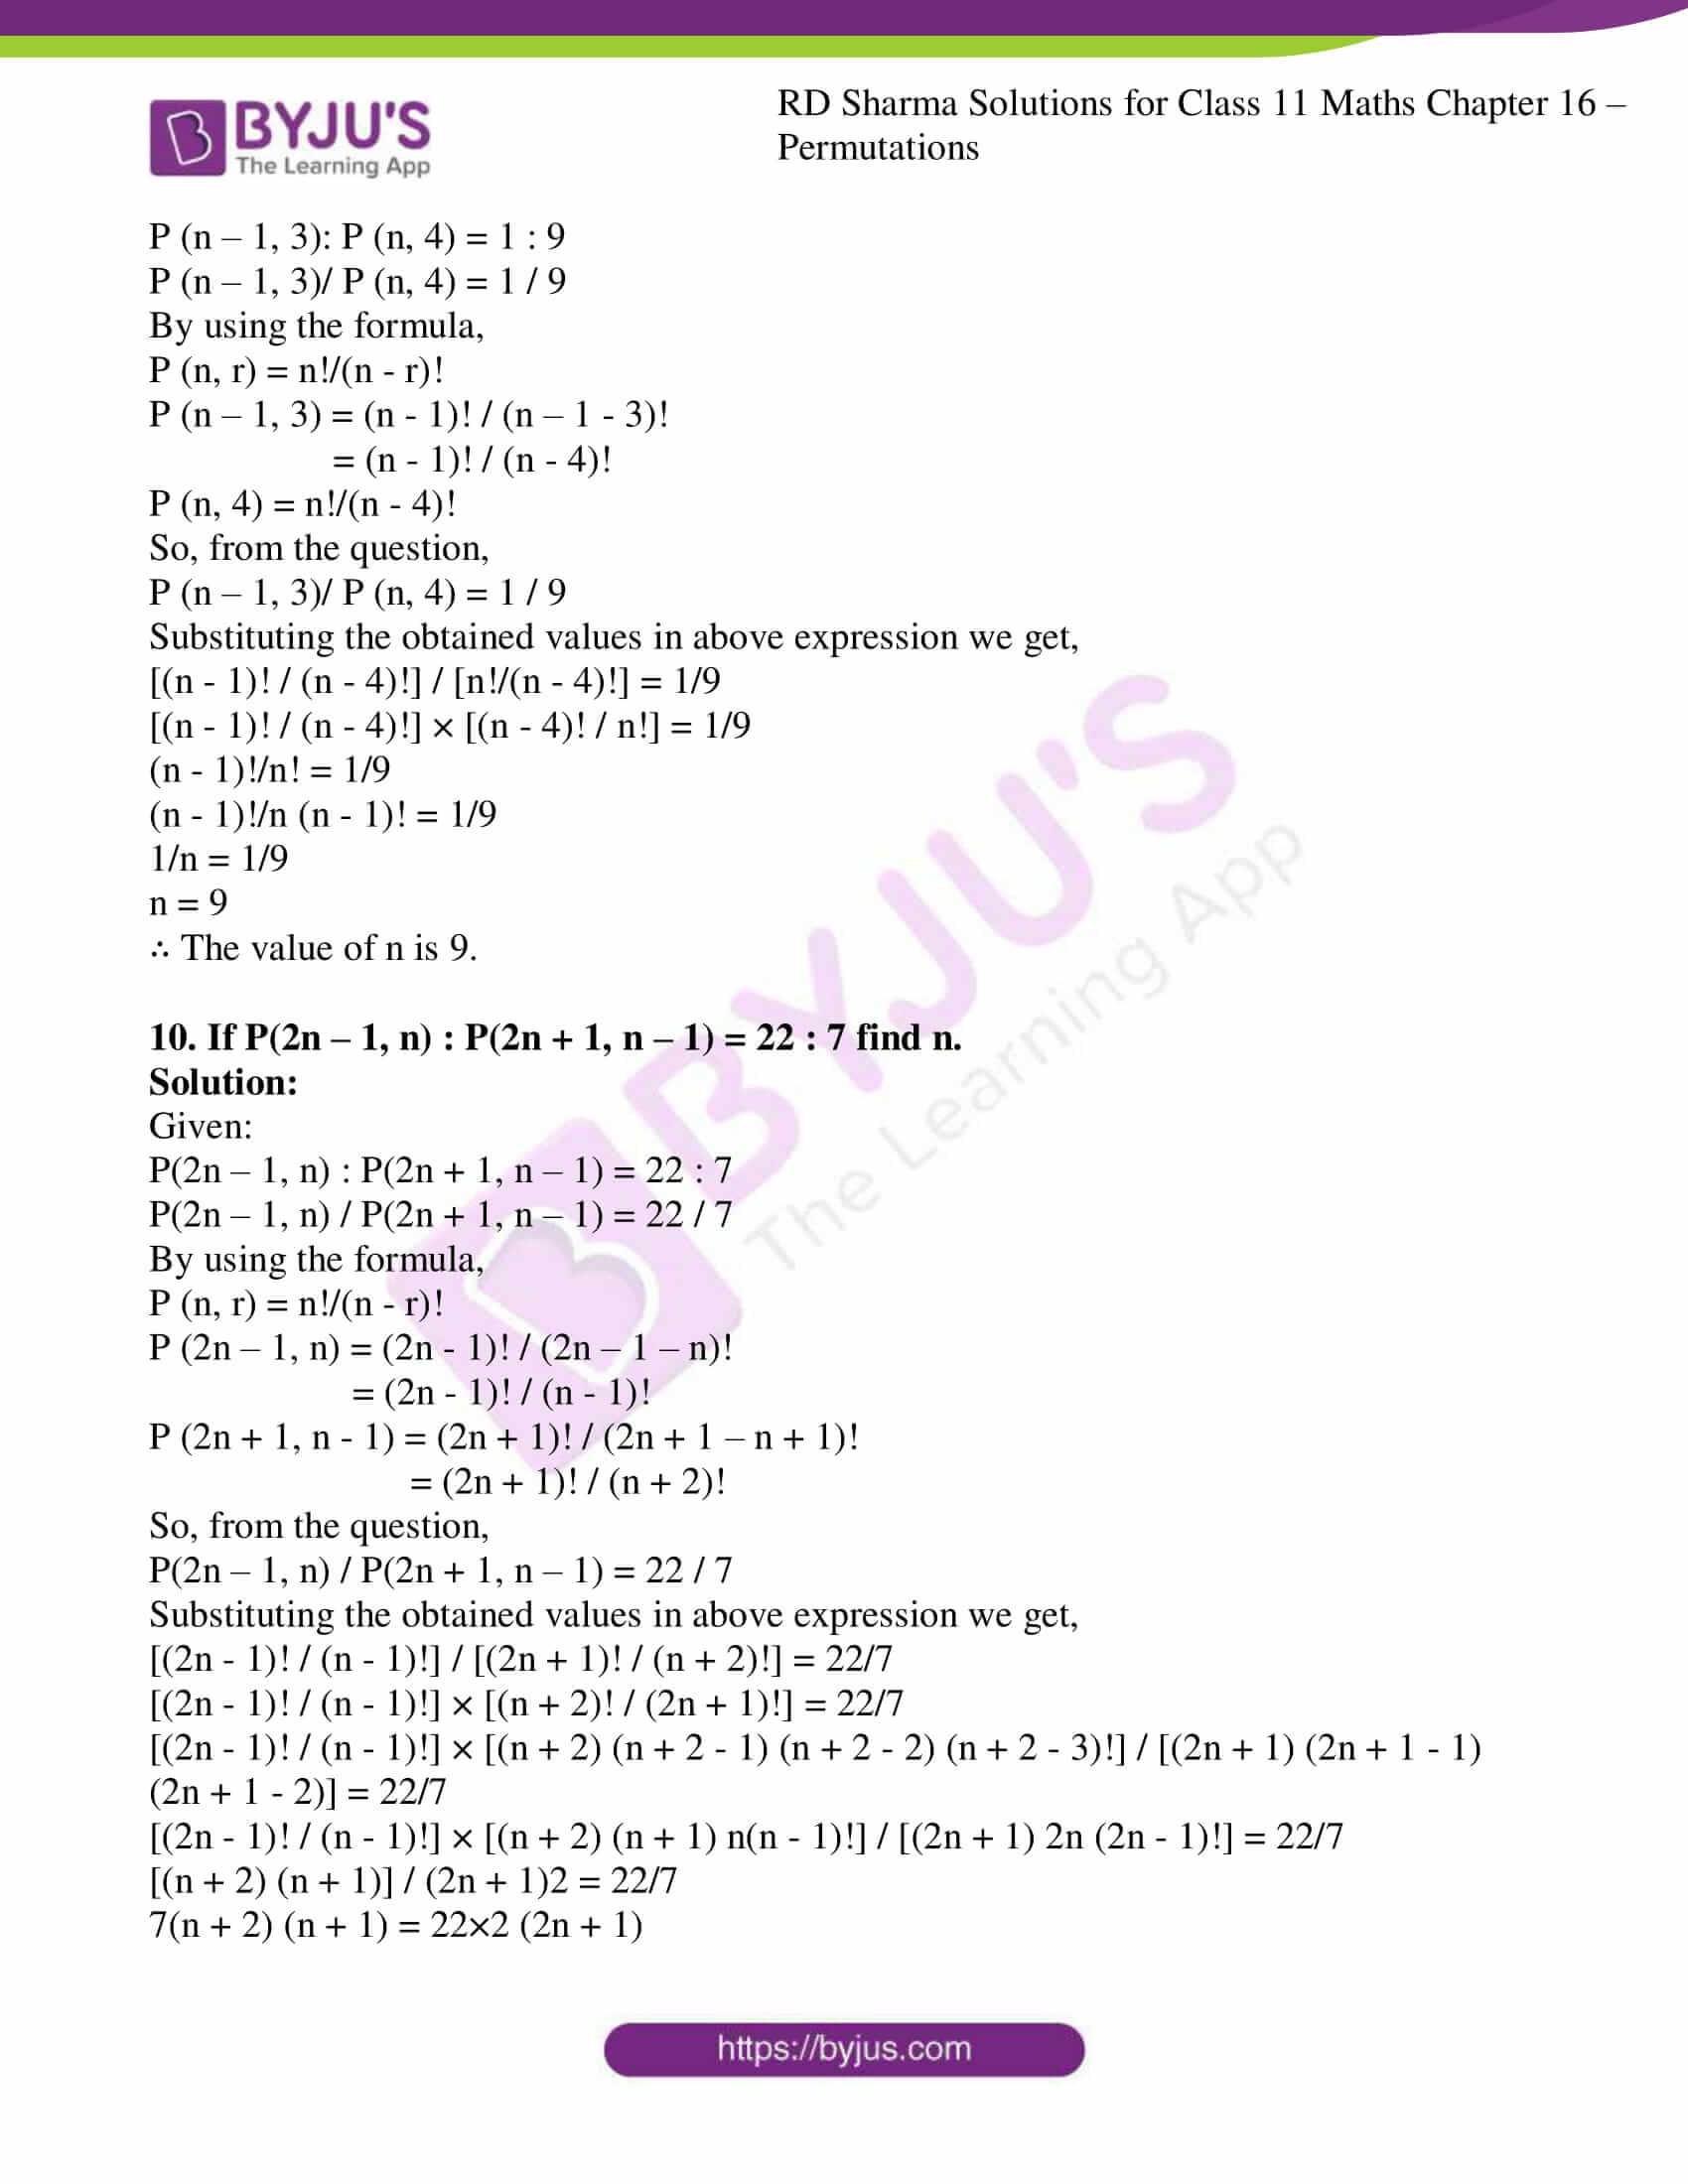 rd sharma class 11 maths ch 16 ex 3 07